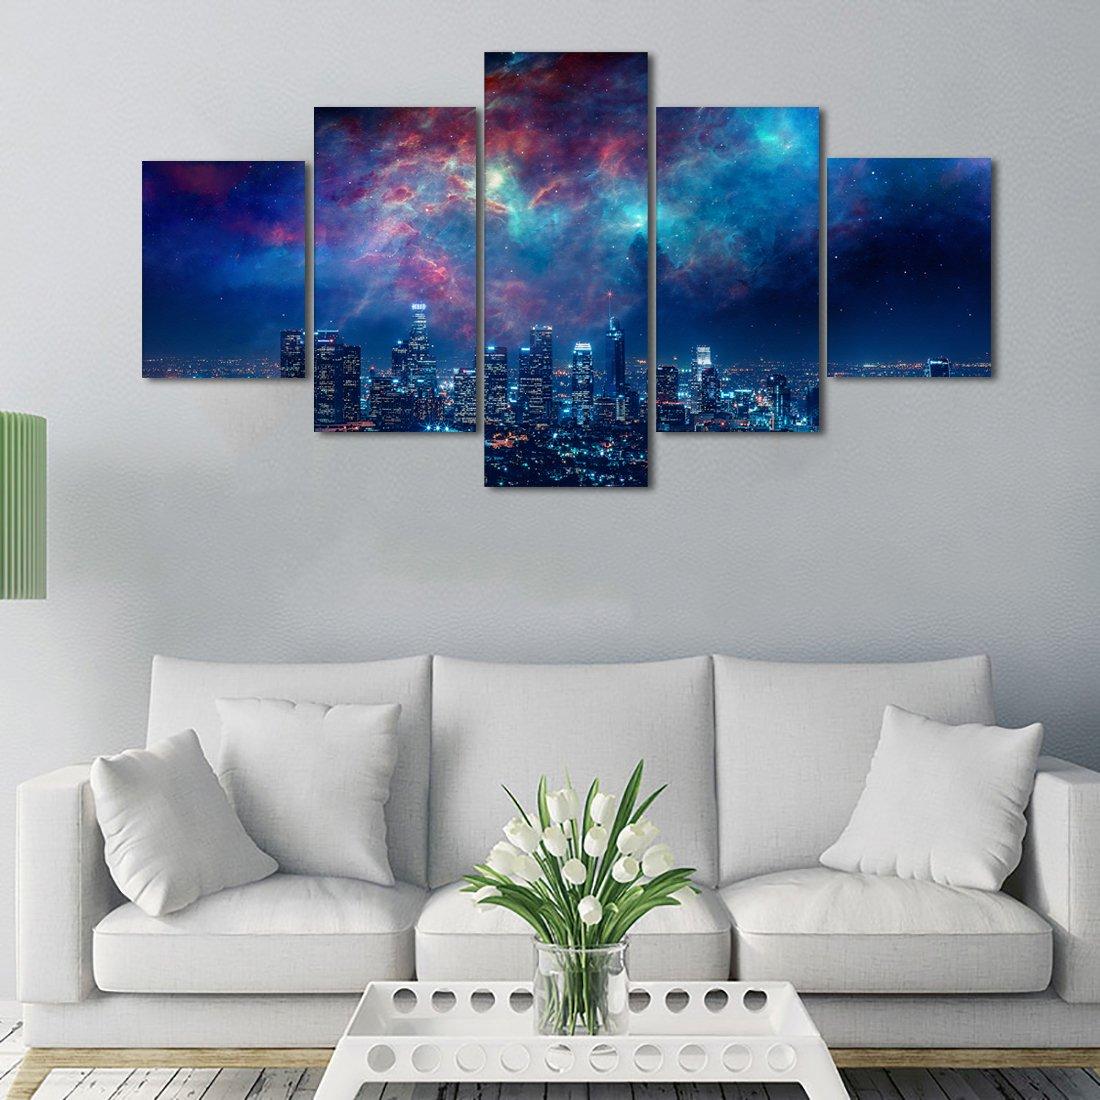 Amazon Com Beautiful Wall Art Painting On Canvas City Night Starry